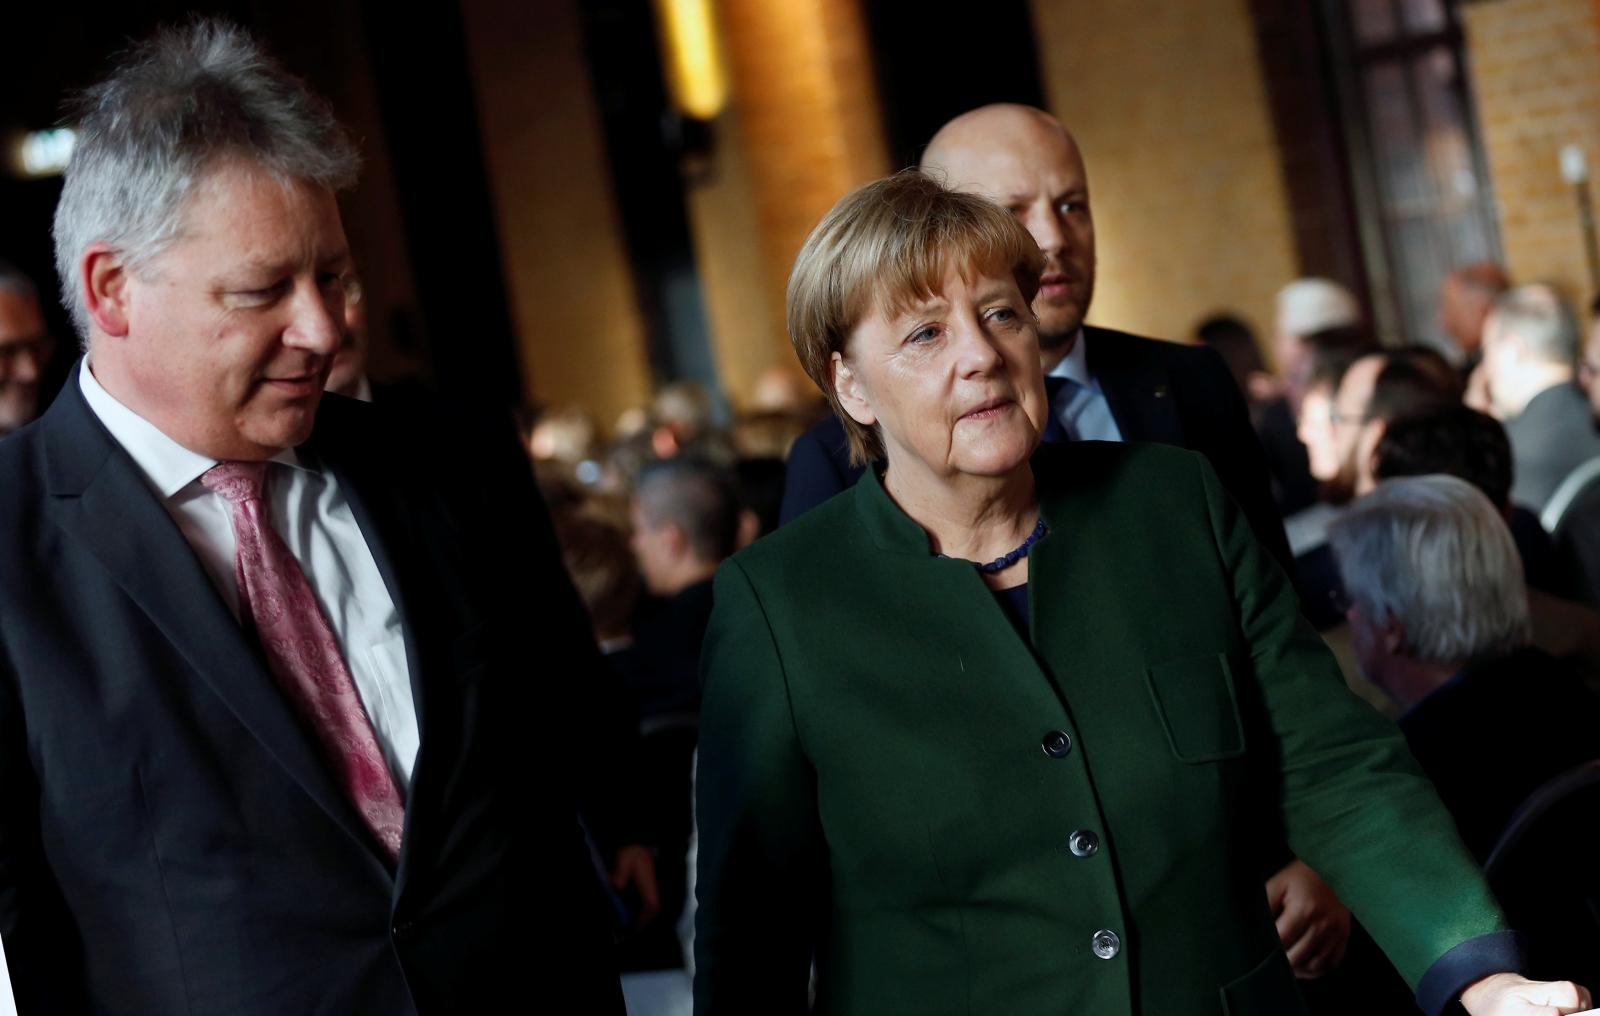 GERMANY-POLITICS-ESPIONAGE